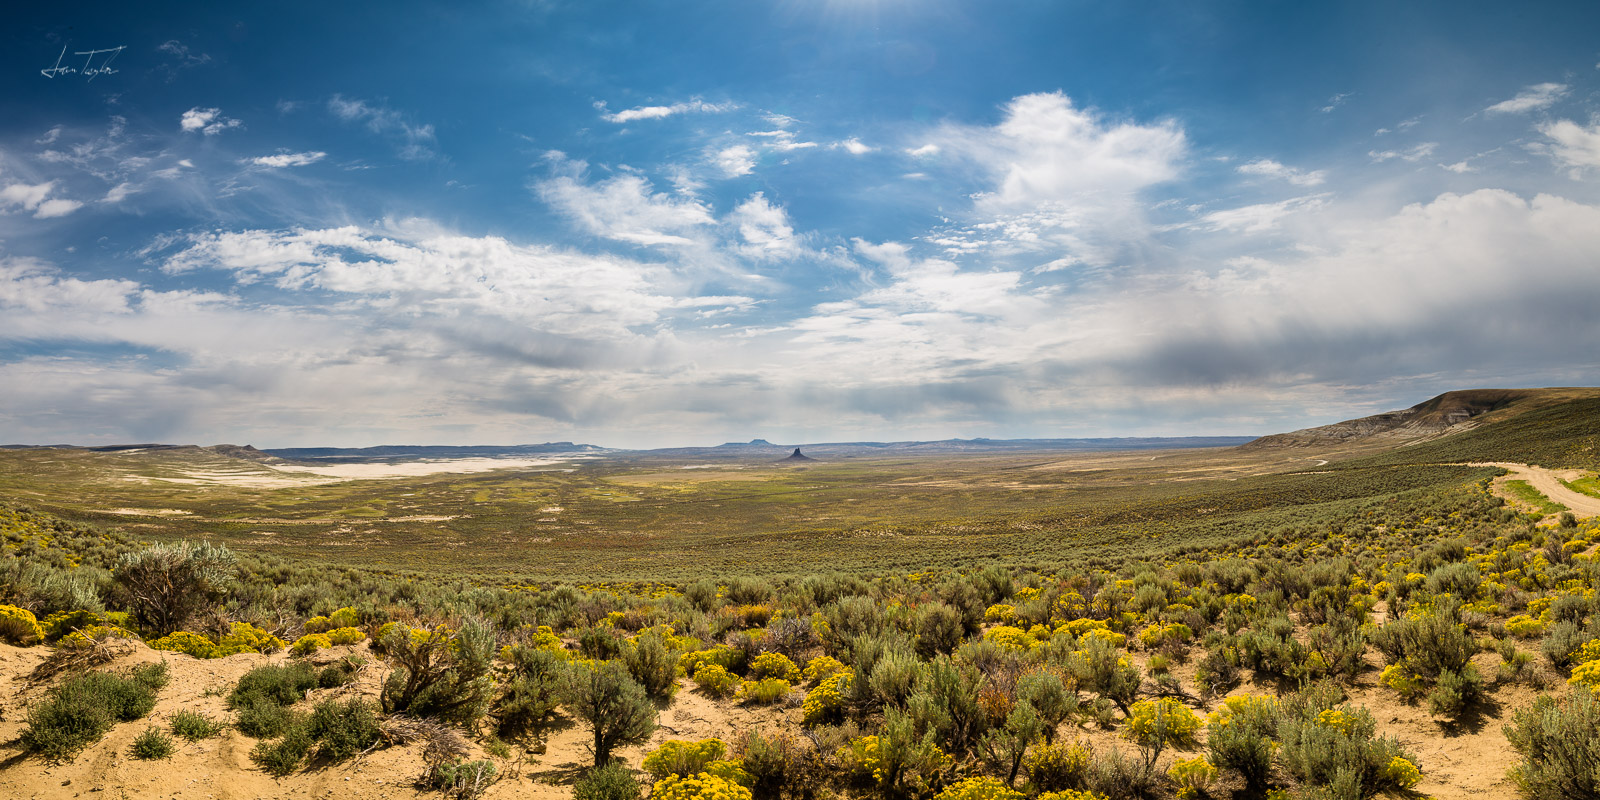 One Year Ago - Wyoming